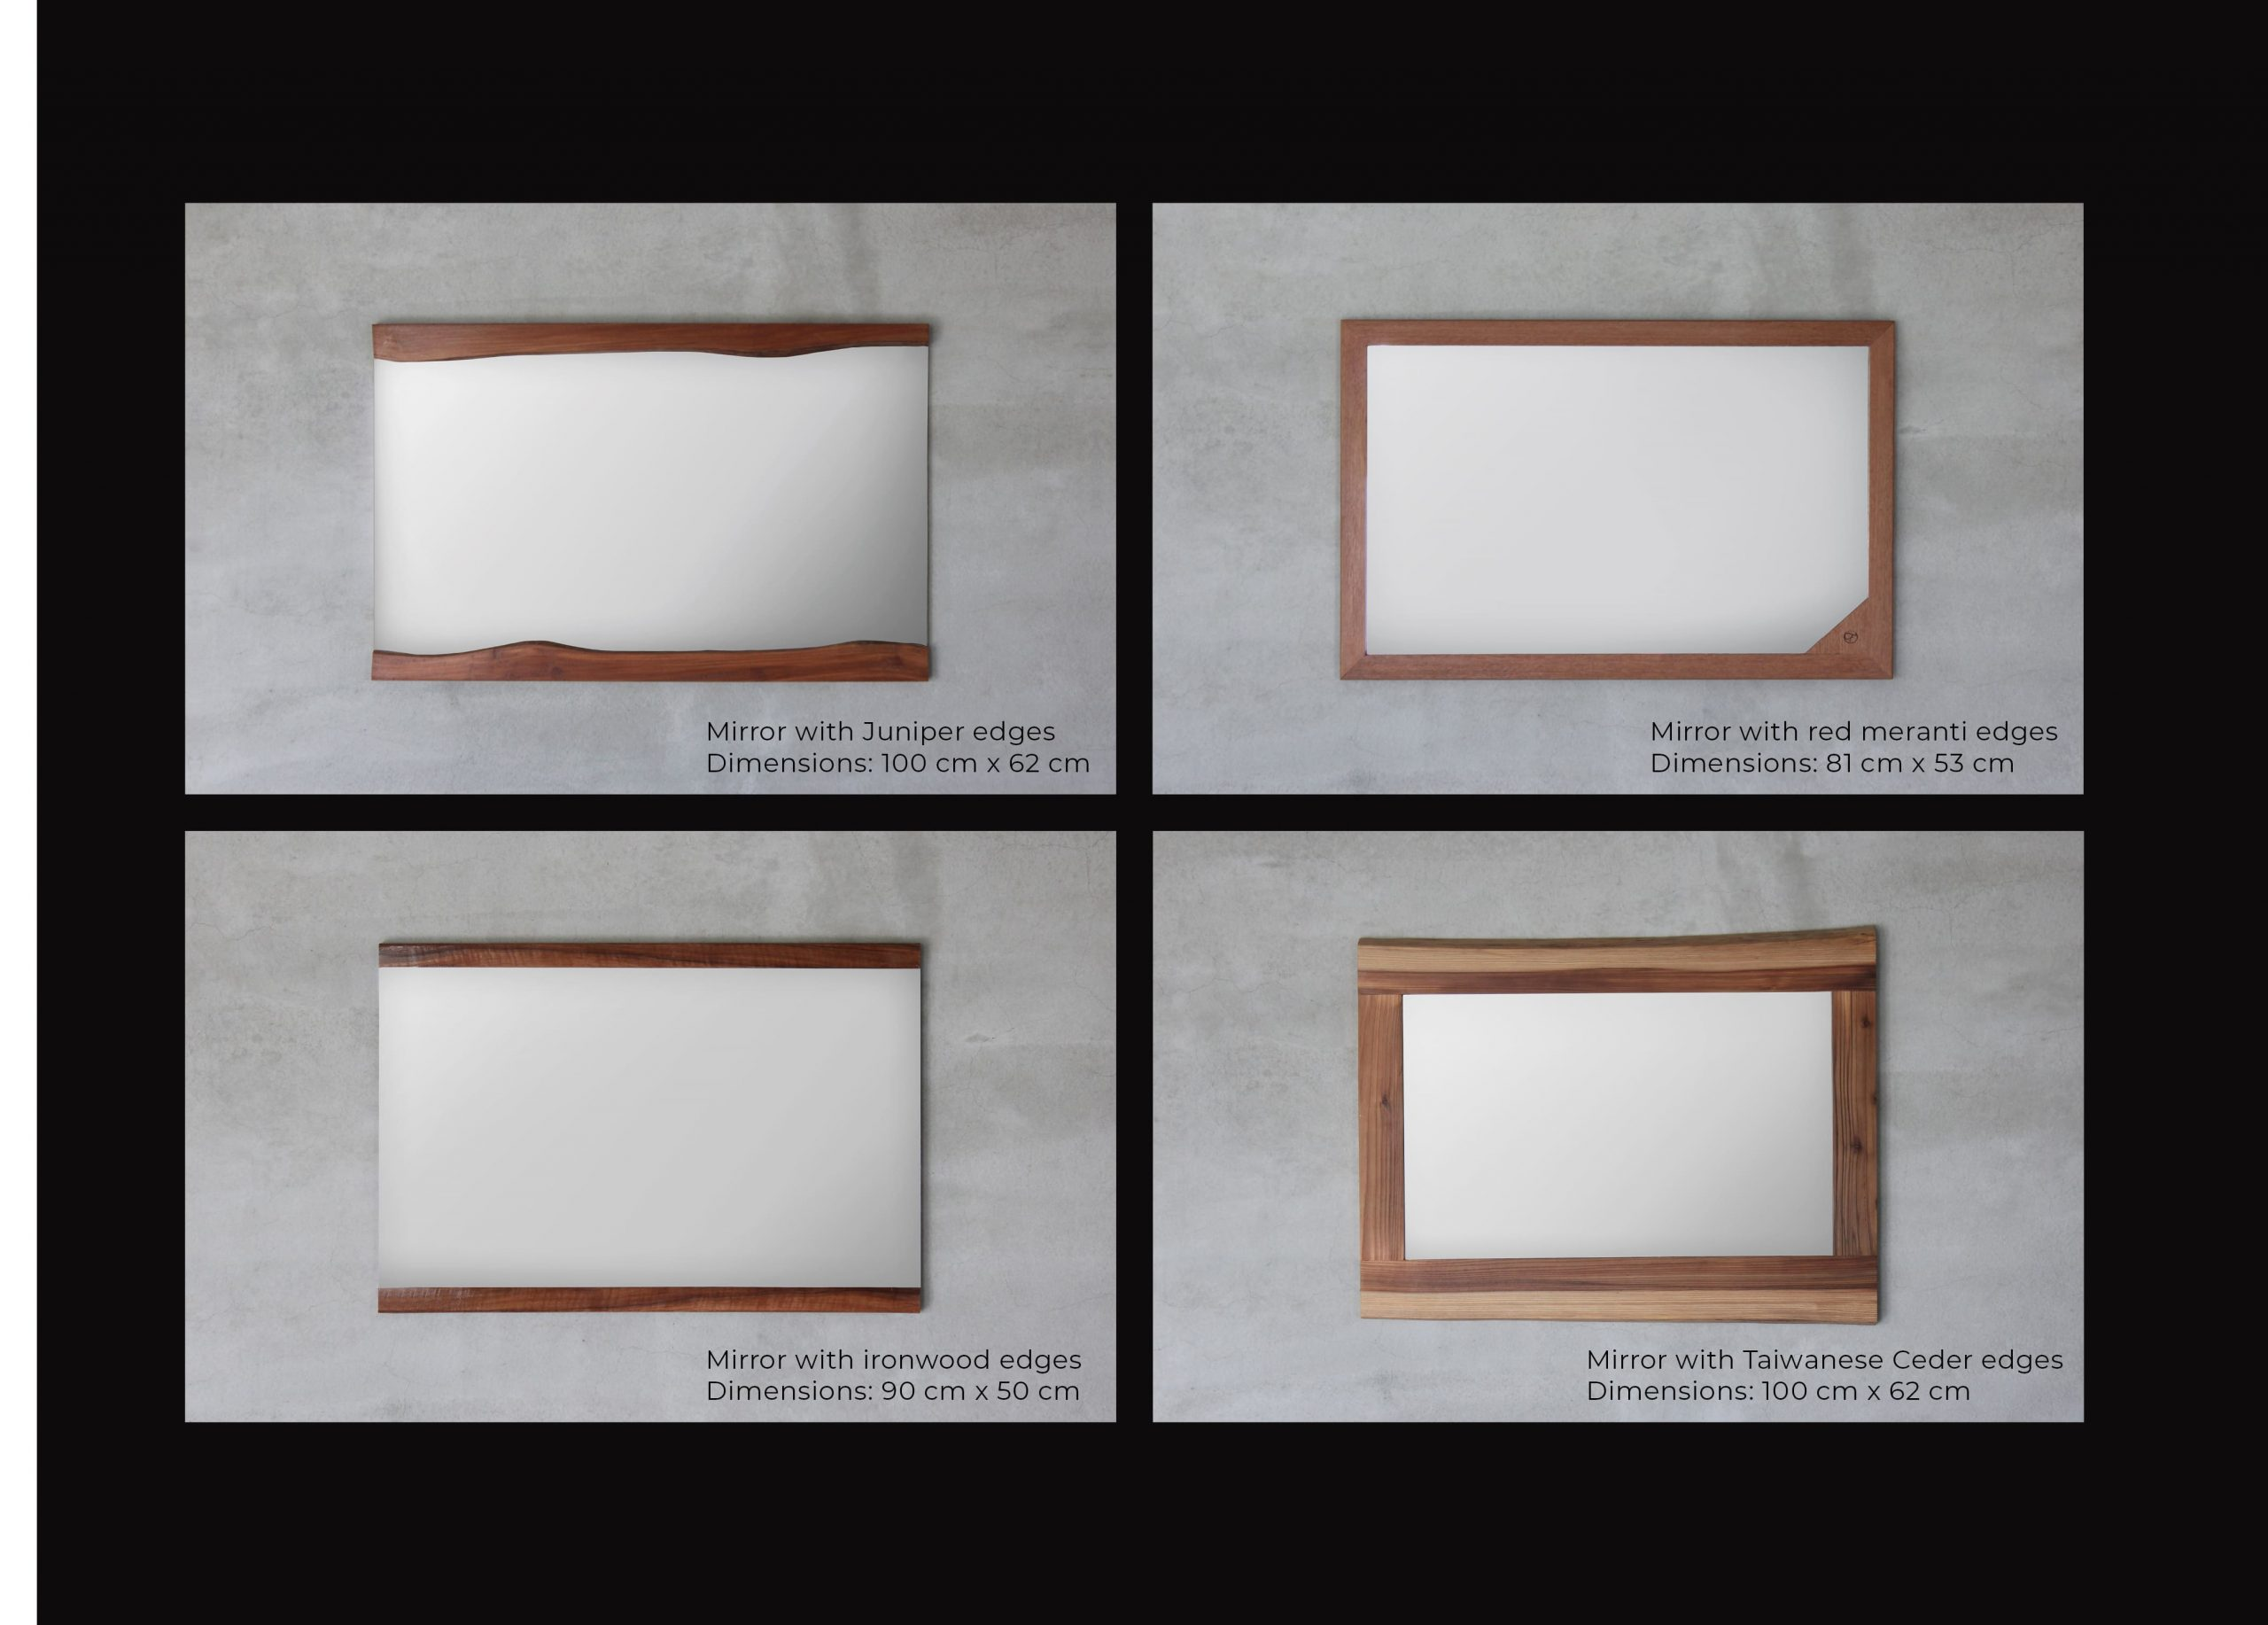 FabsFurniture Taiwan Portfolio - 2021 - wooden mirrors